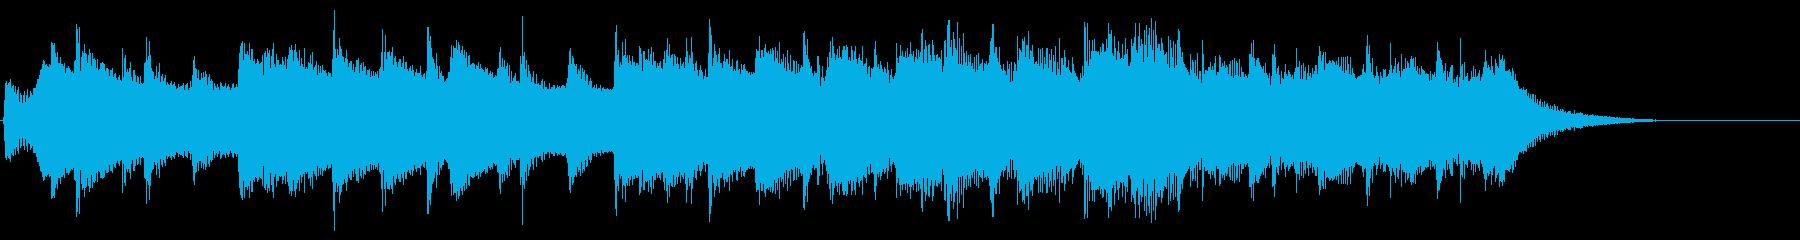 8bitジングル チップチューン場面転換の再生済みの波形